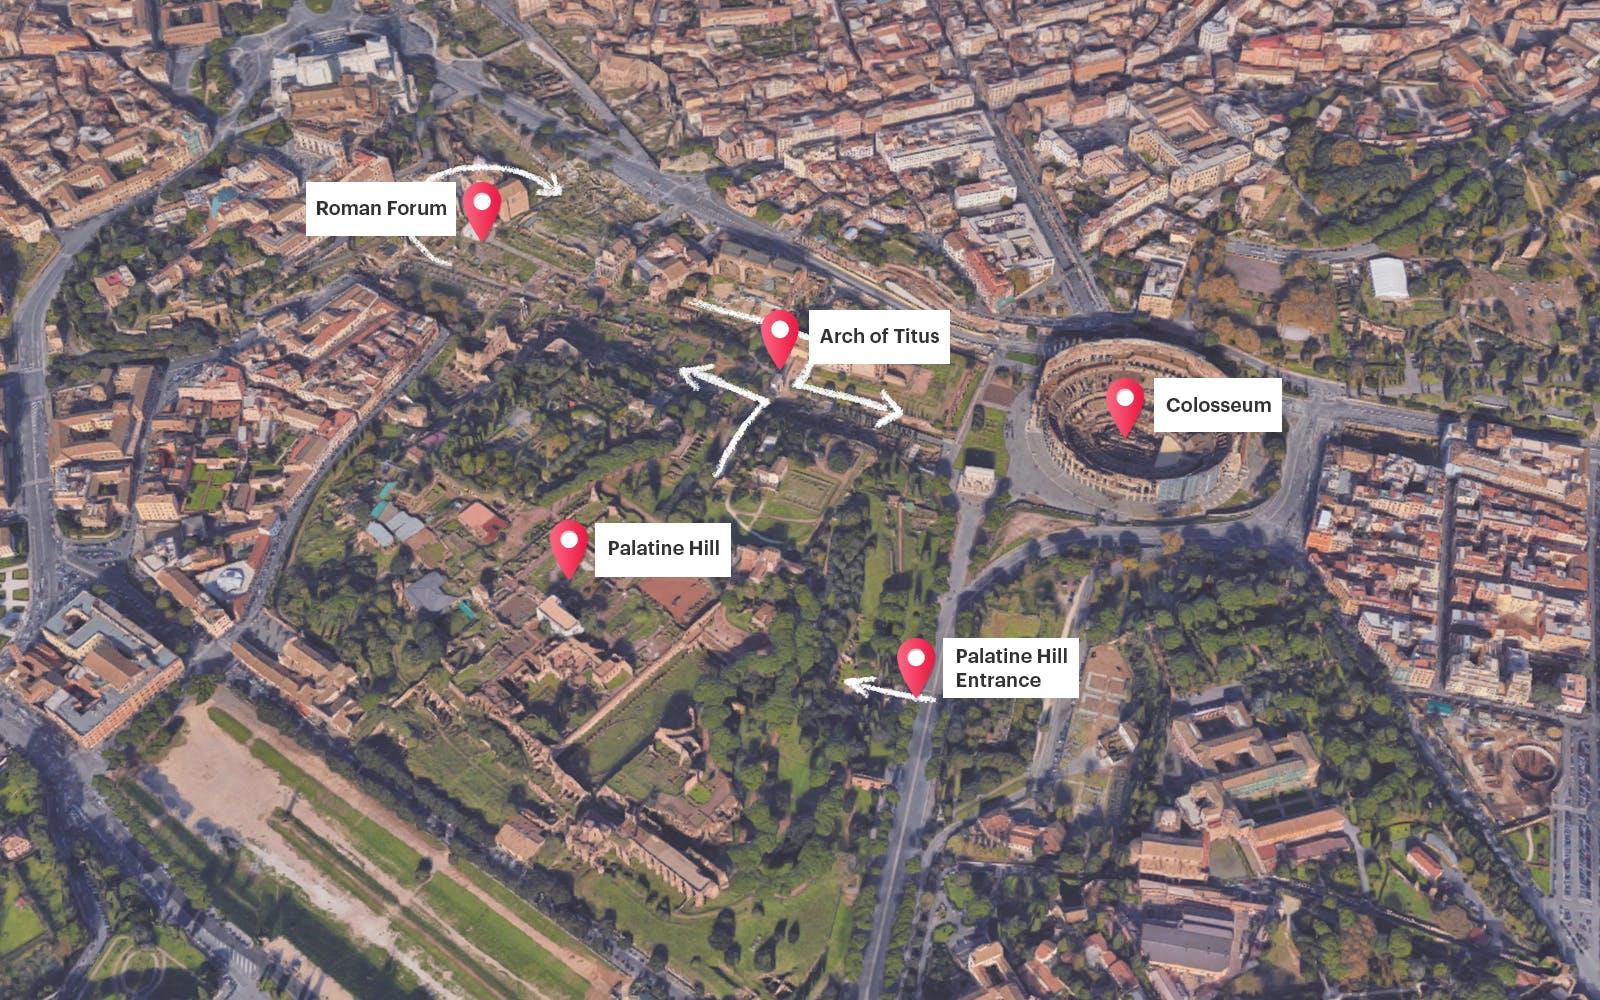 rome skip the line - colosseum, roman forum, palatine hill